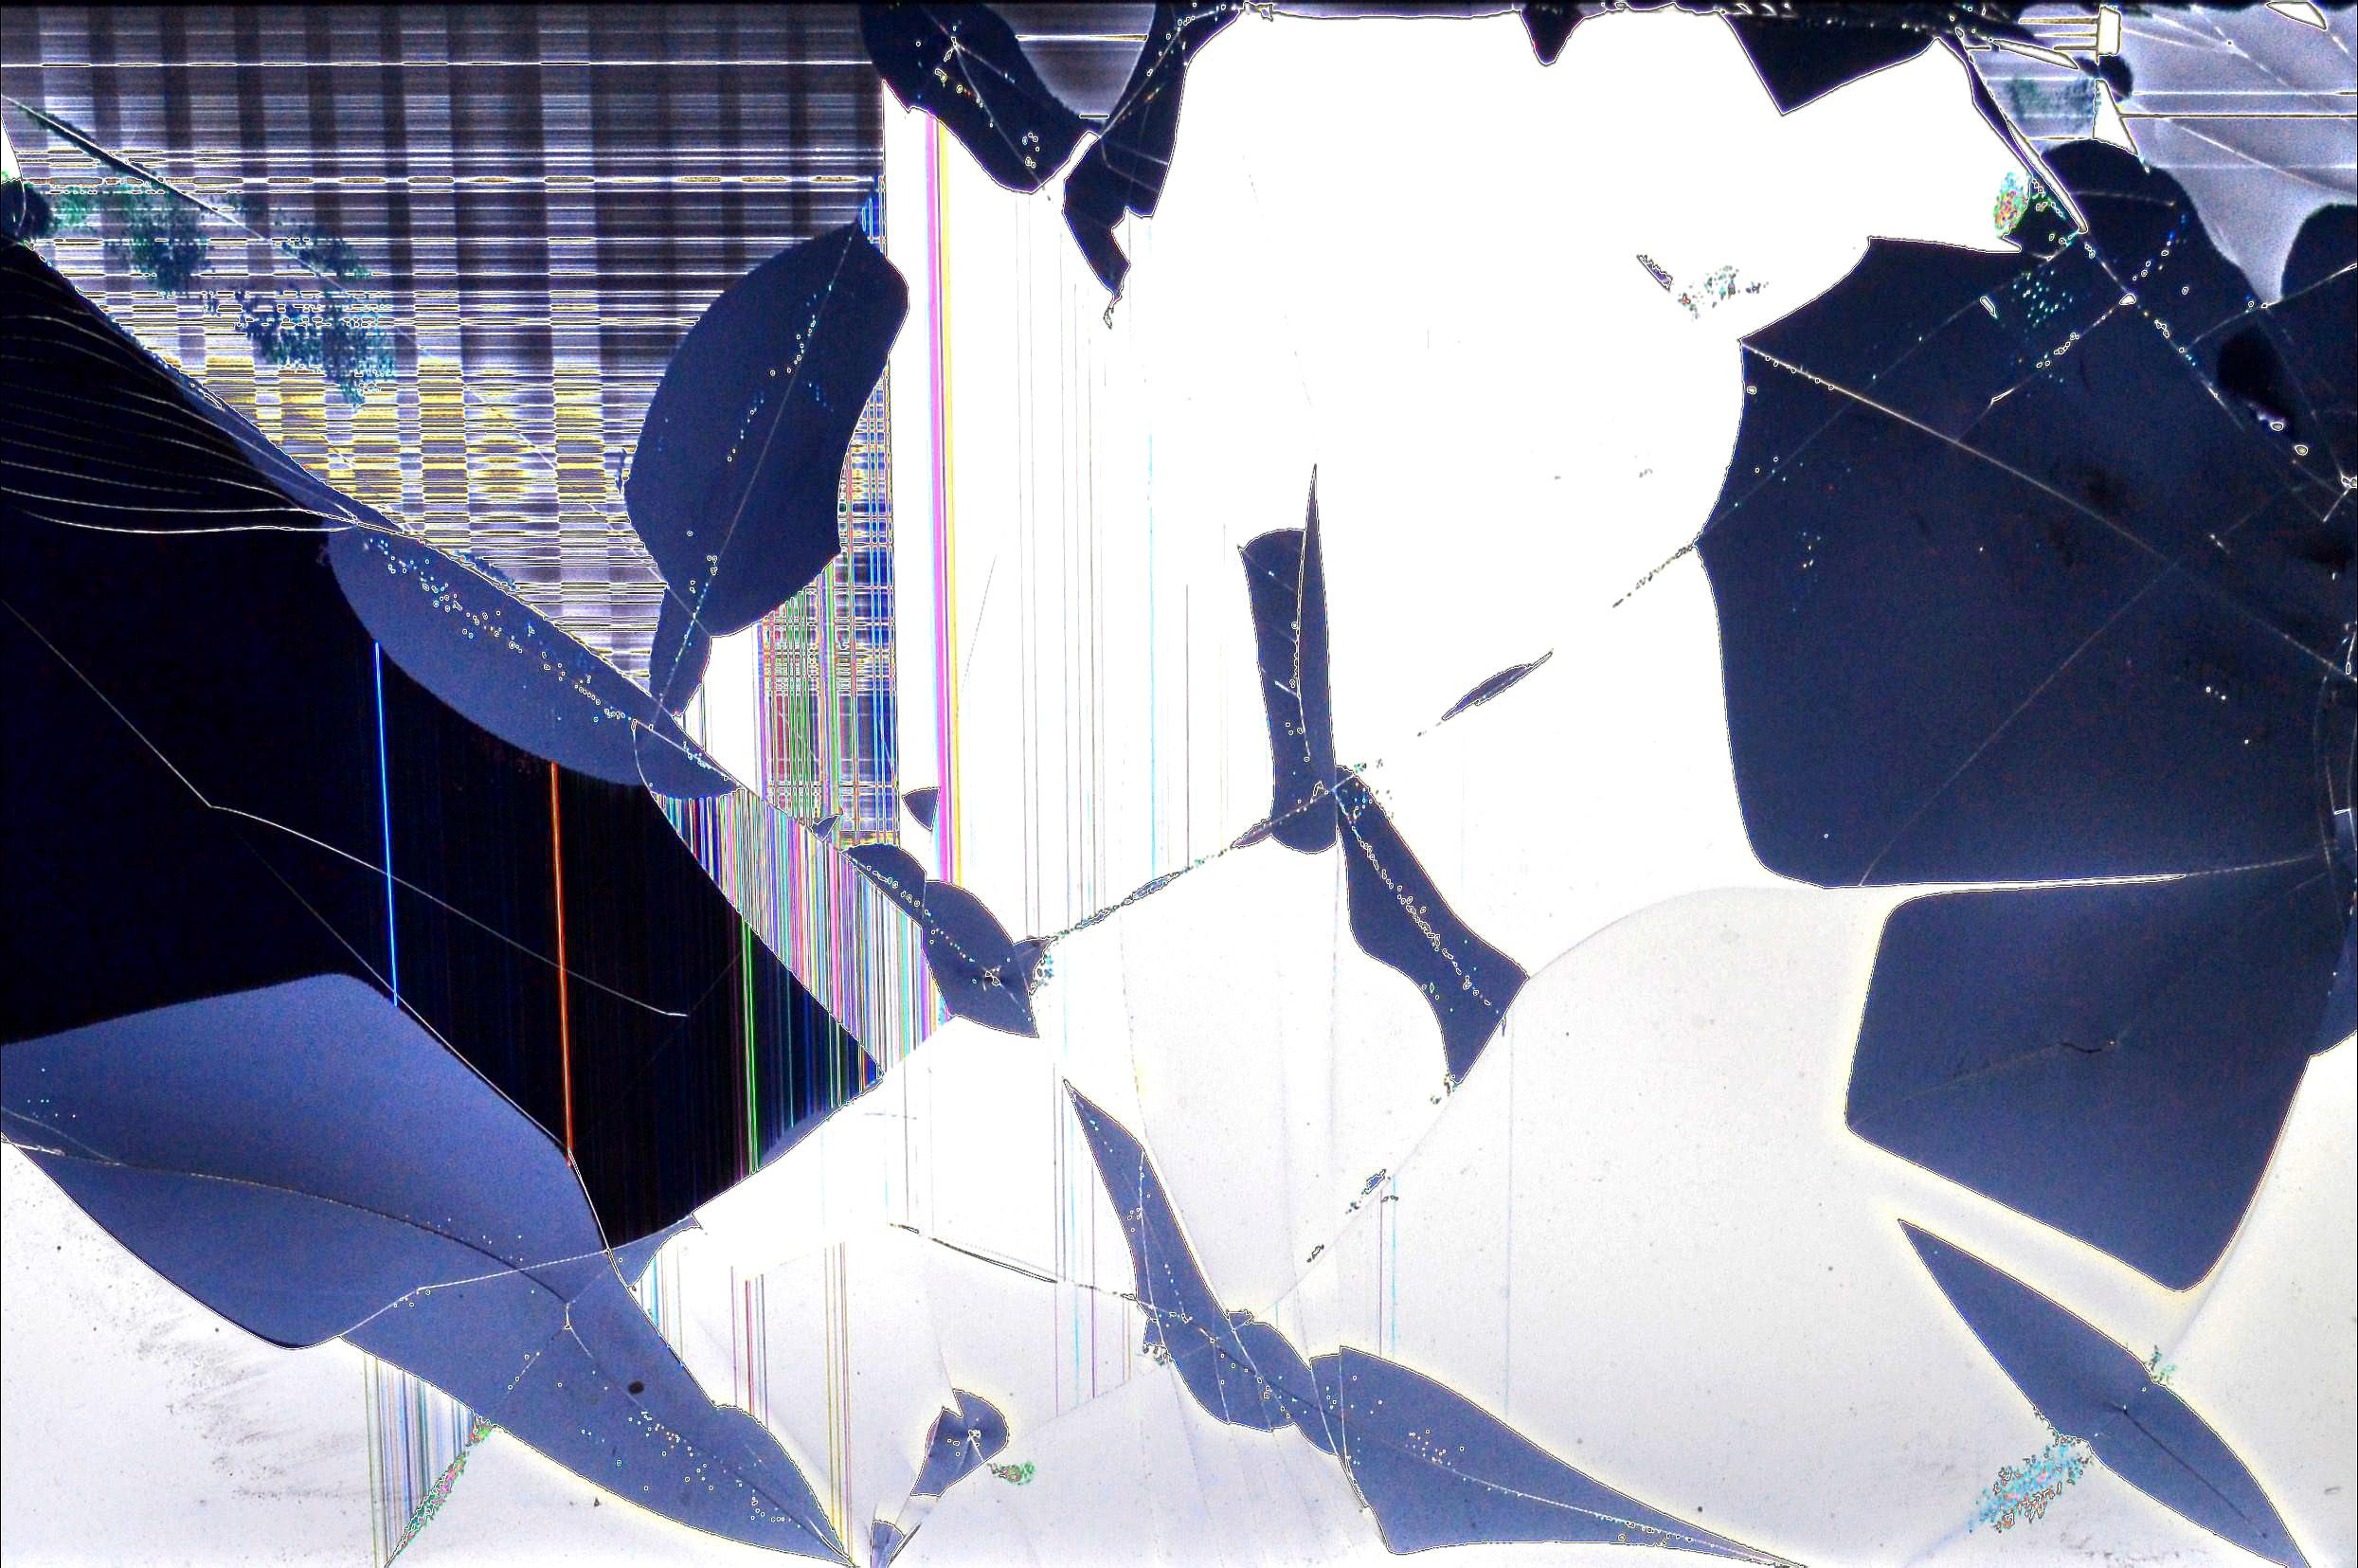 cracked tv screen prank wallpaper 62 images - HD2489×1655